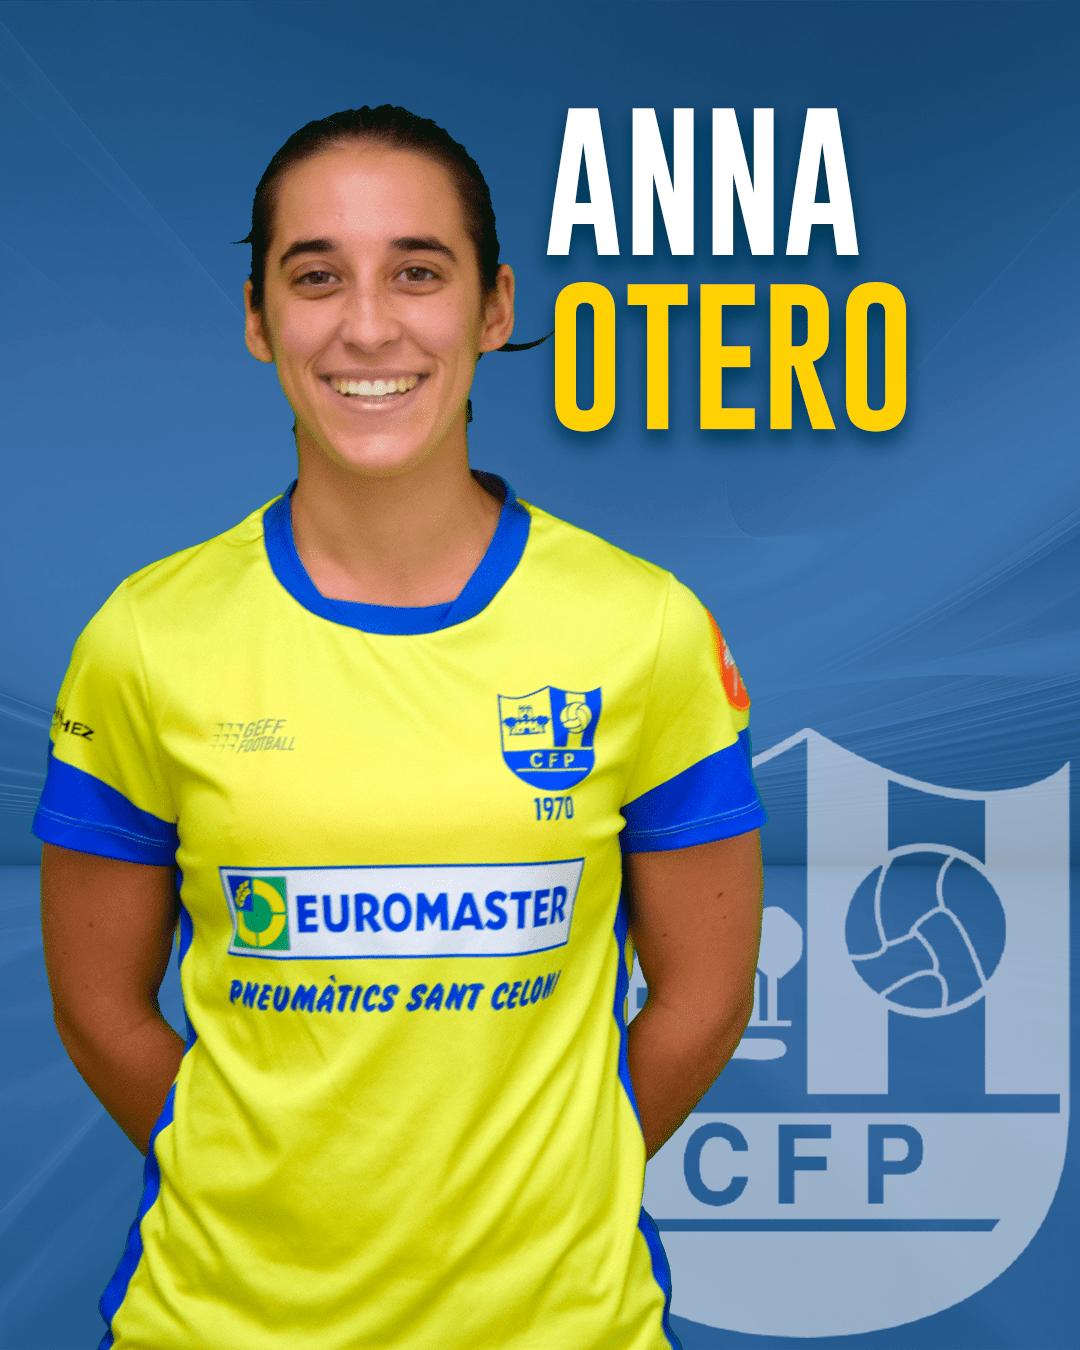 Anna Otero